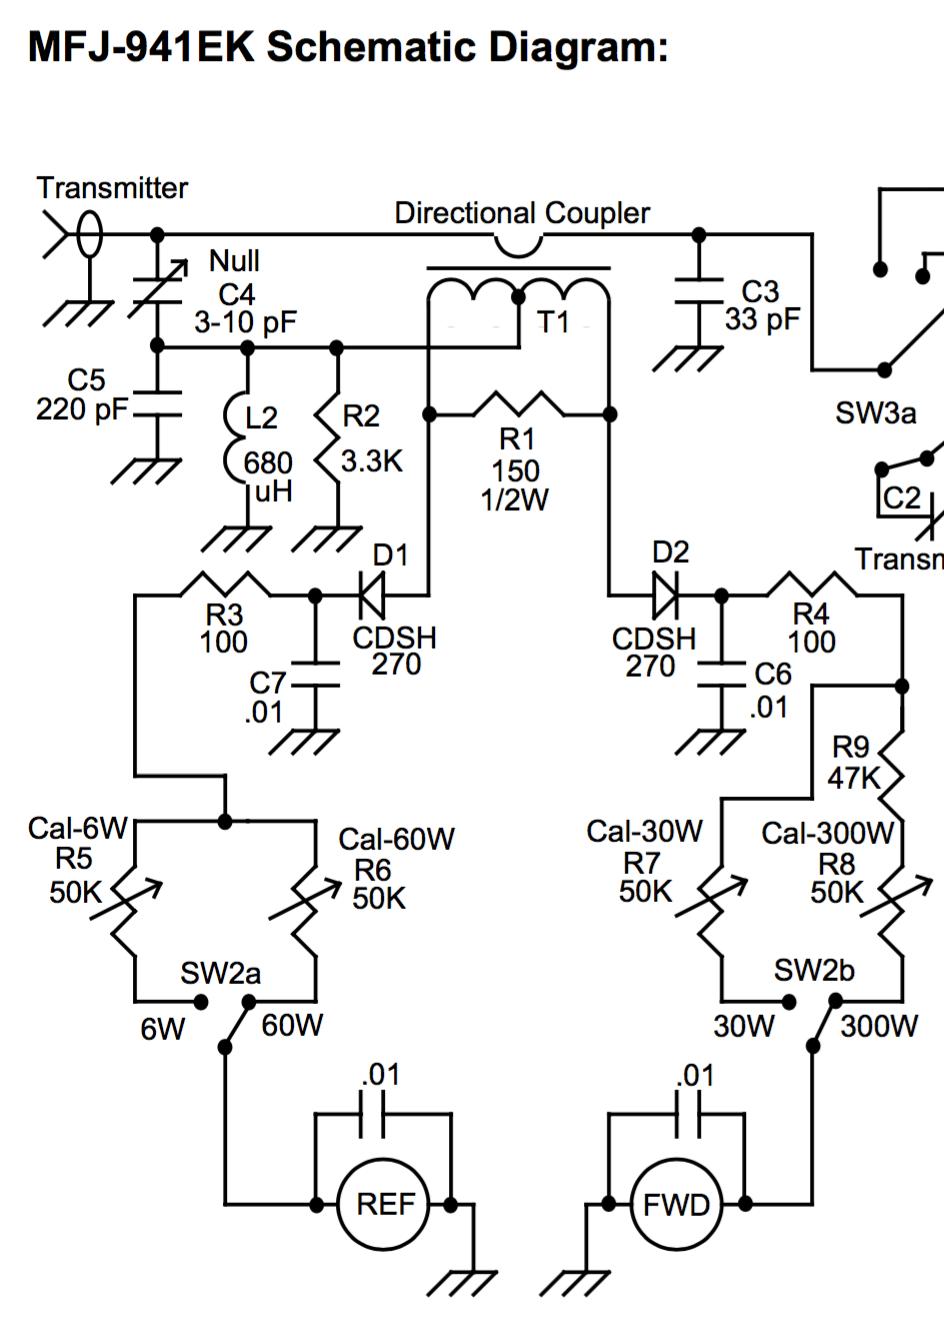 medium resolution of wattmeter half of mfj 941ek schematic diagram